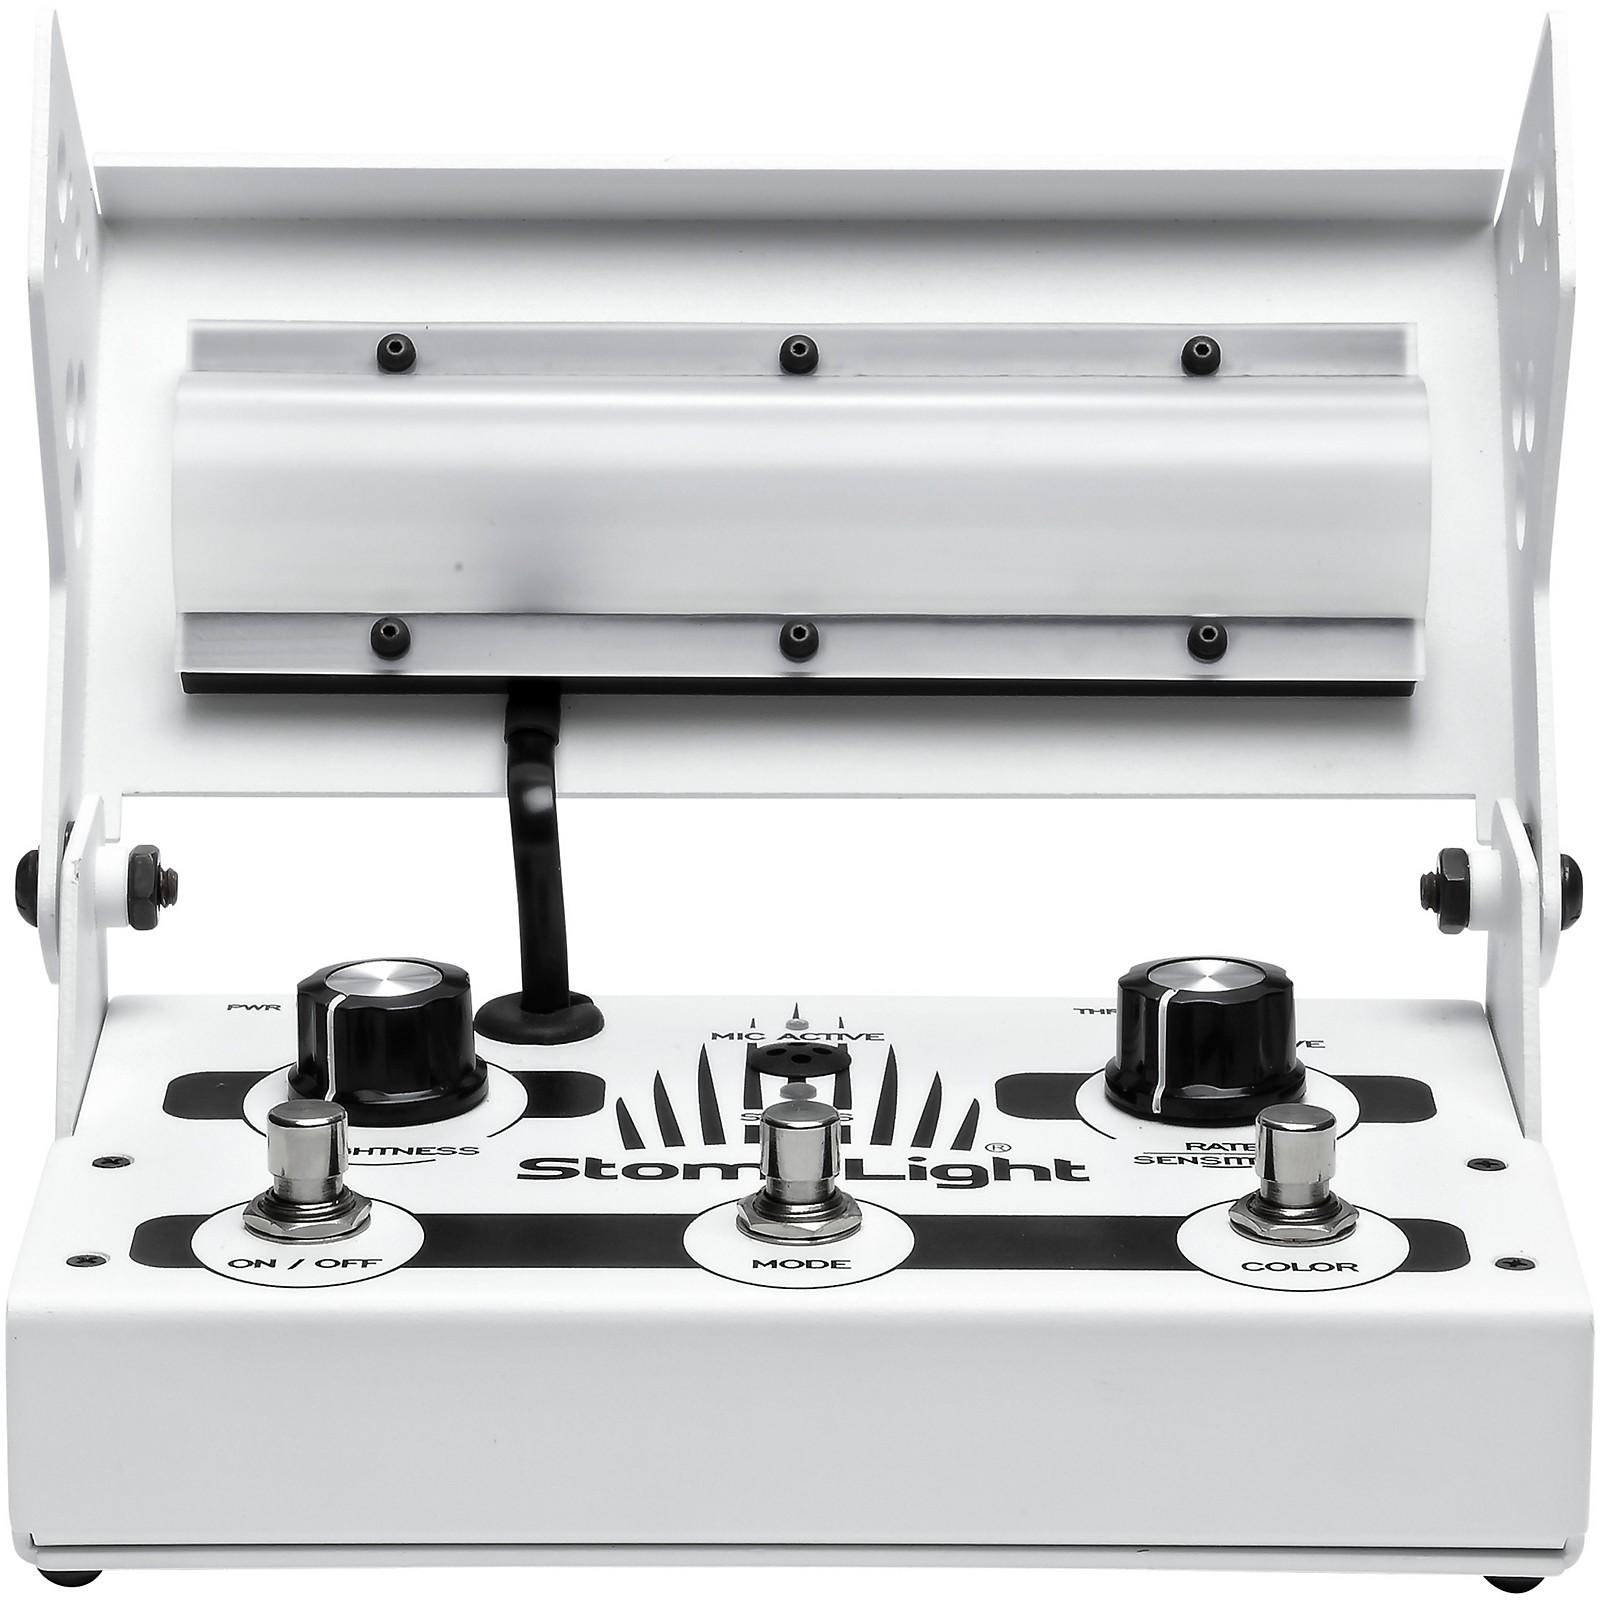 StompLight DMX Pro Lighting Effect Pedal